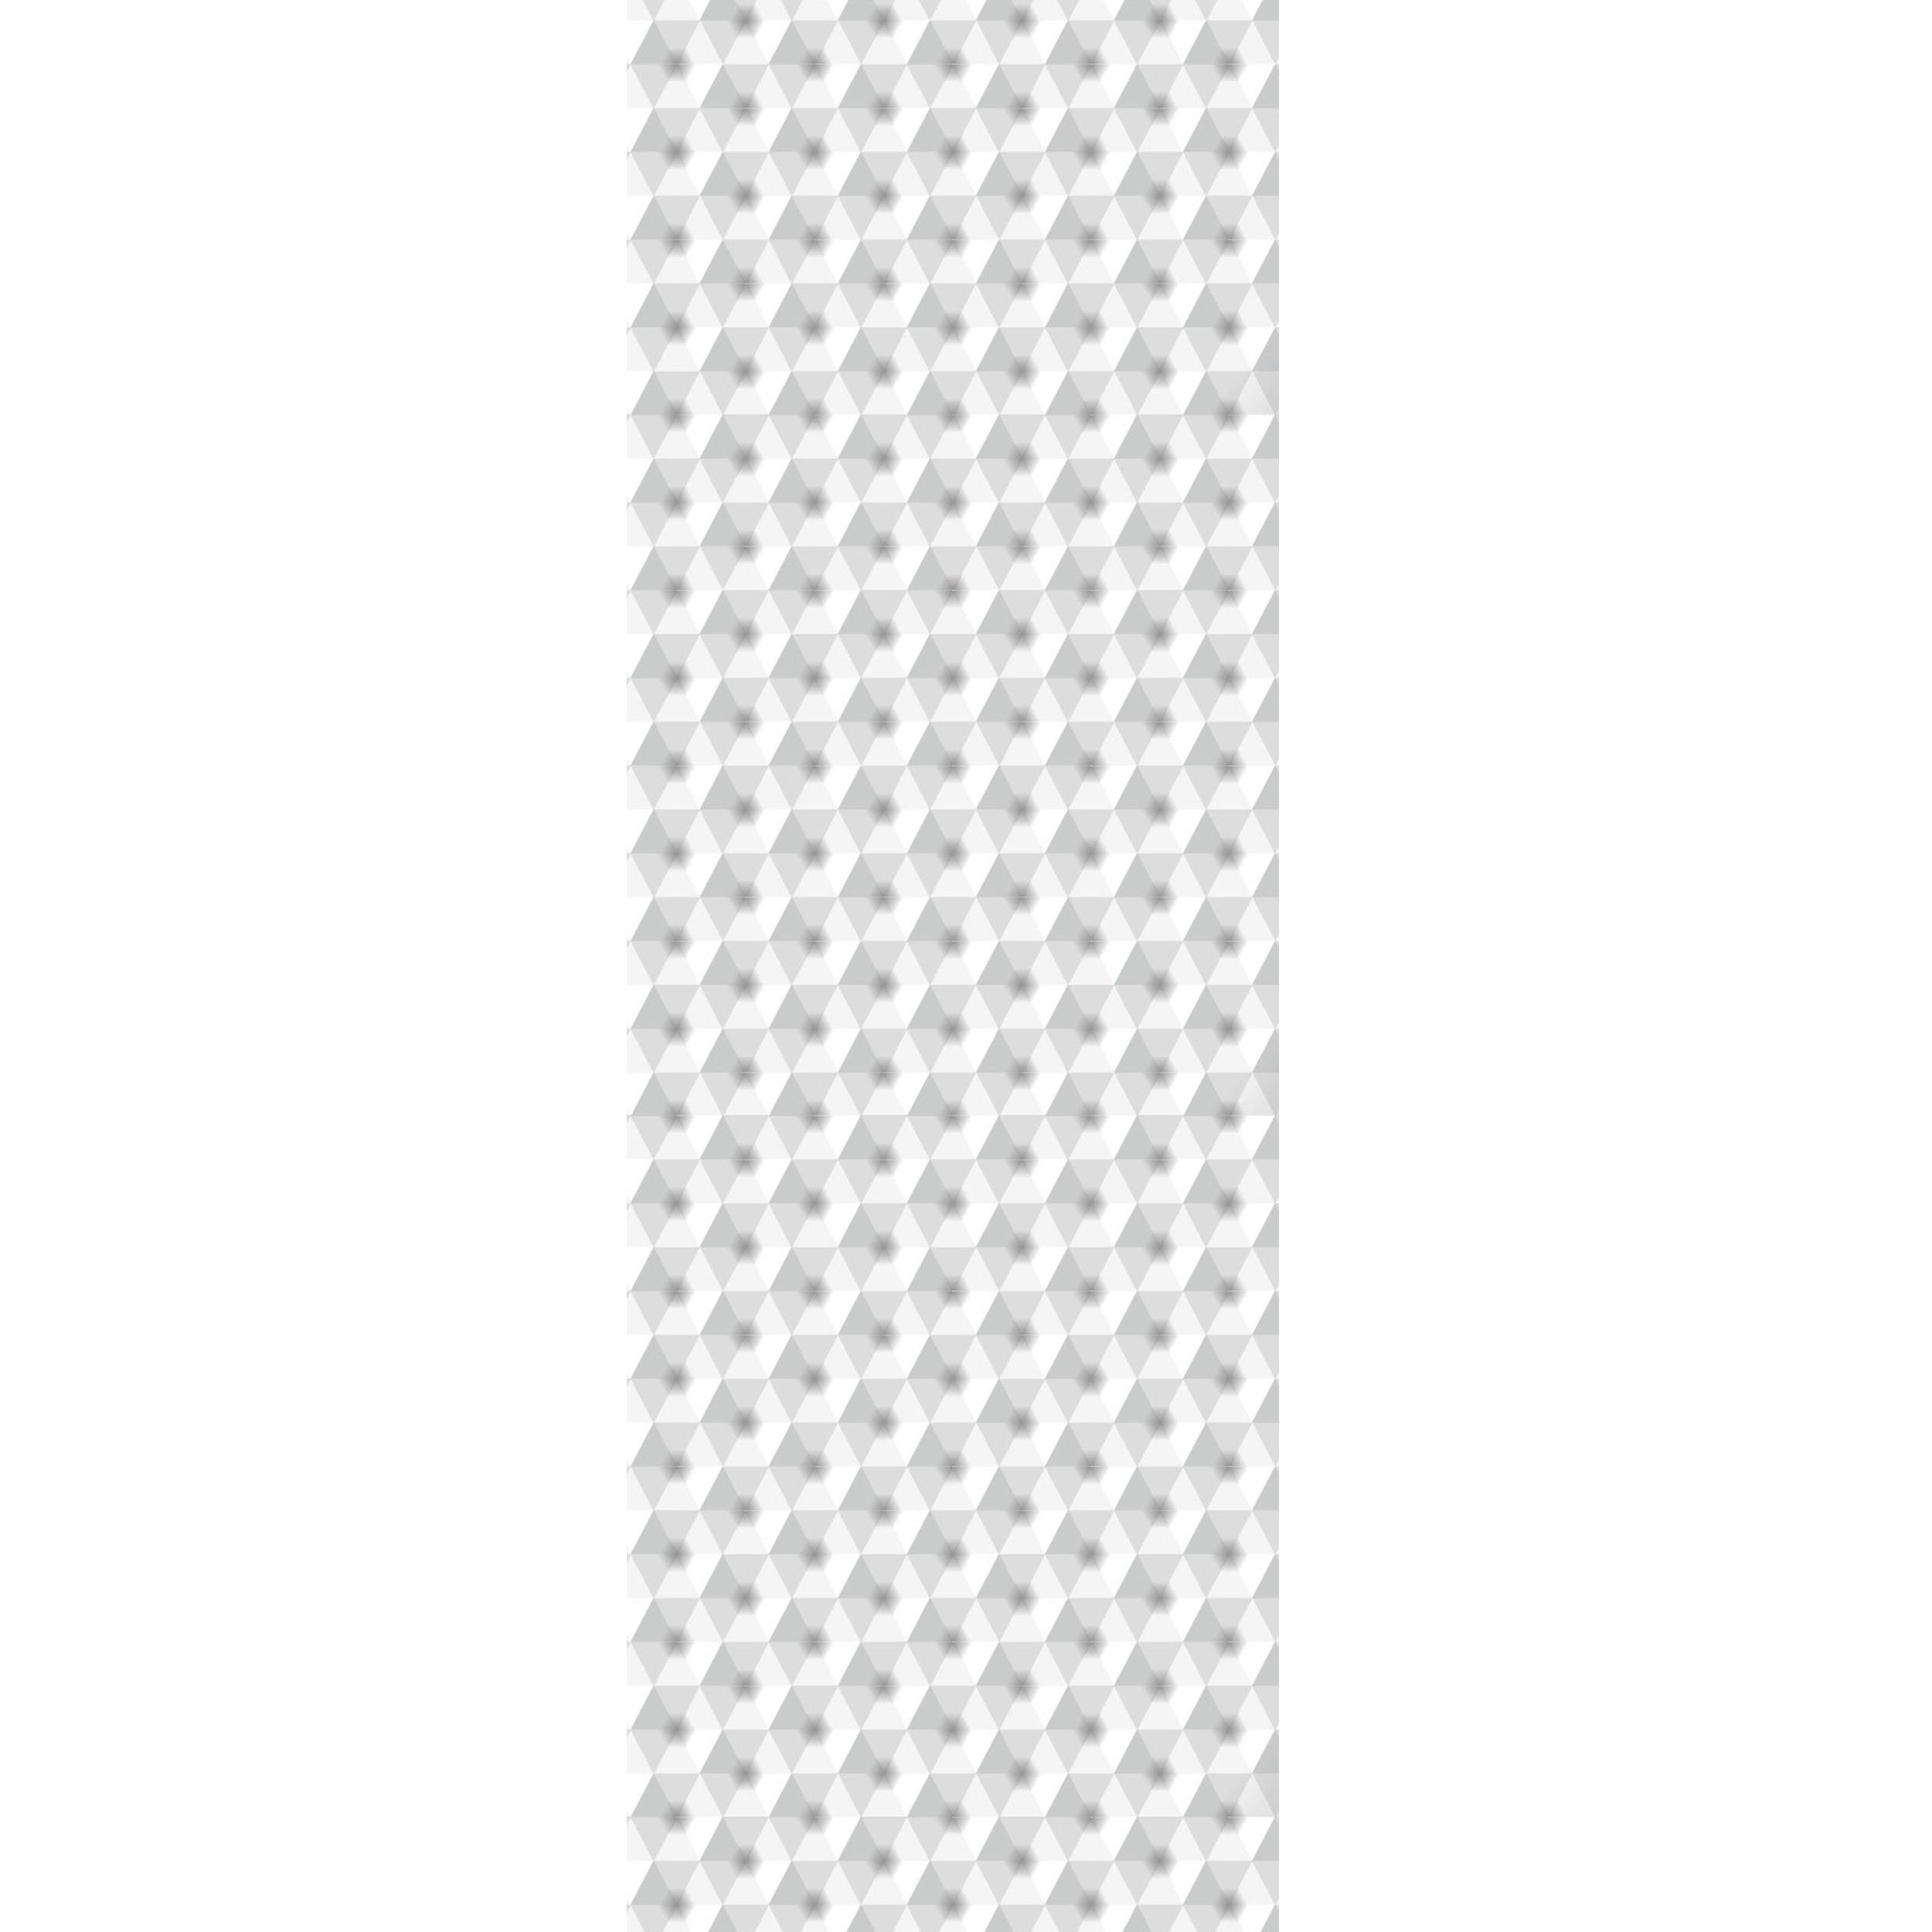 achat le motifs blanc gris clair